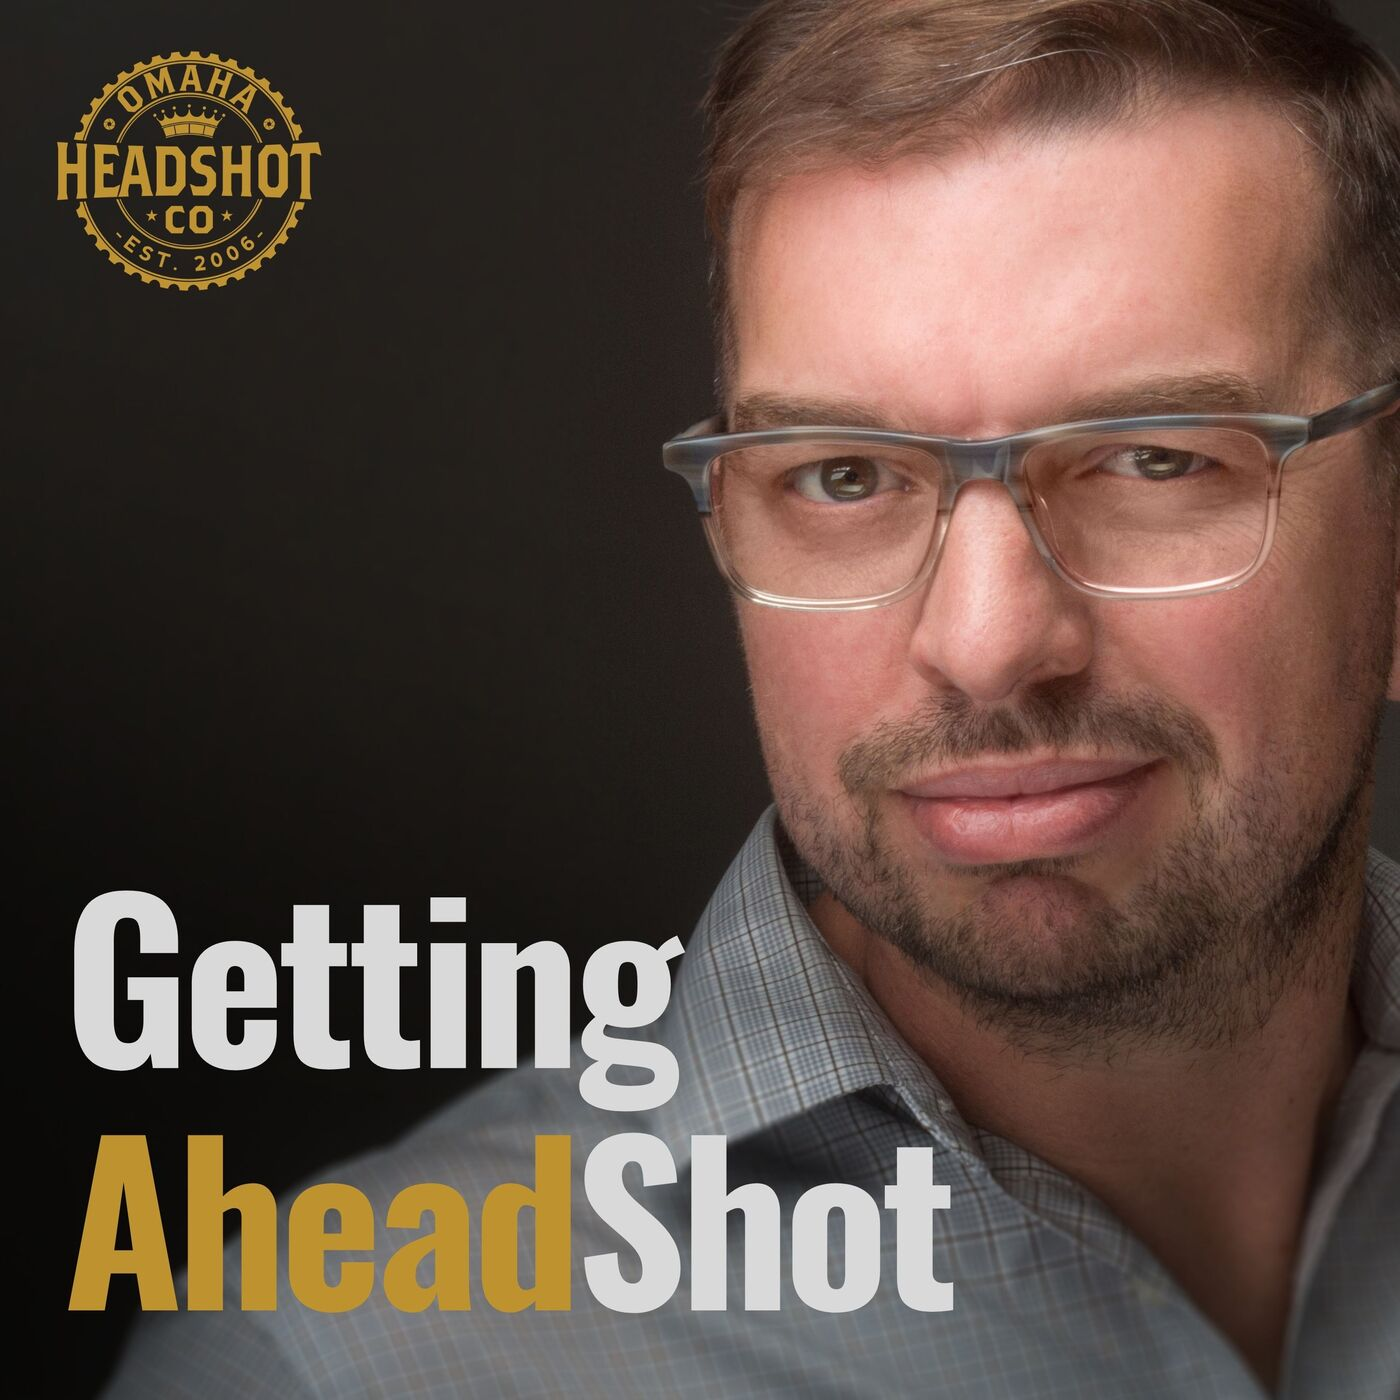 Getting AheadShot